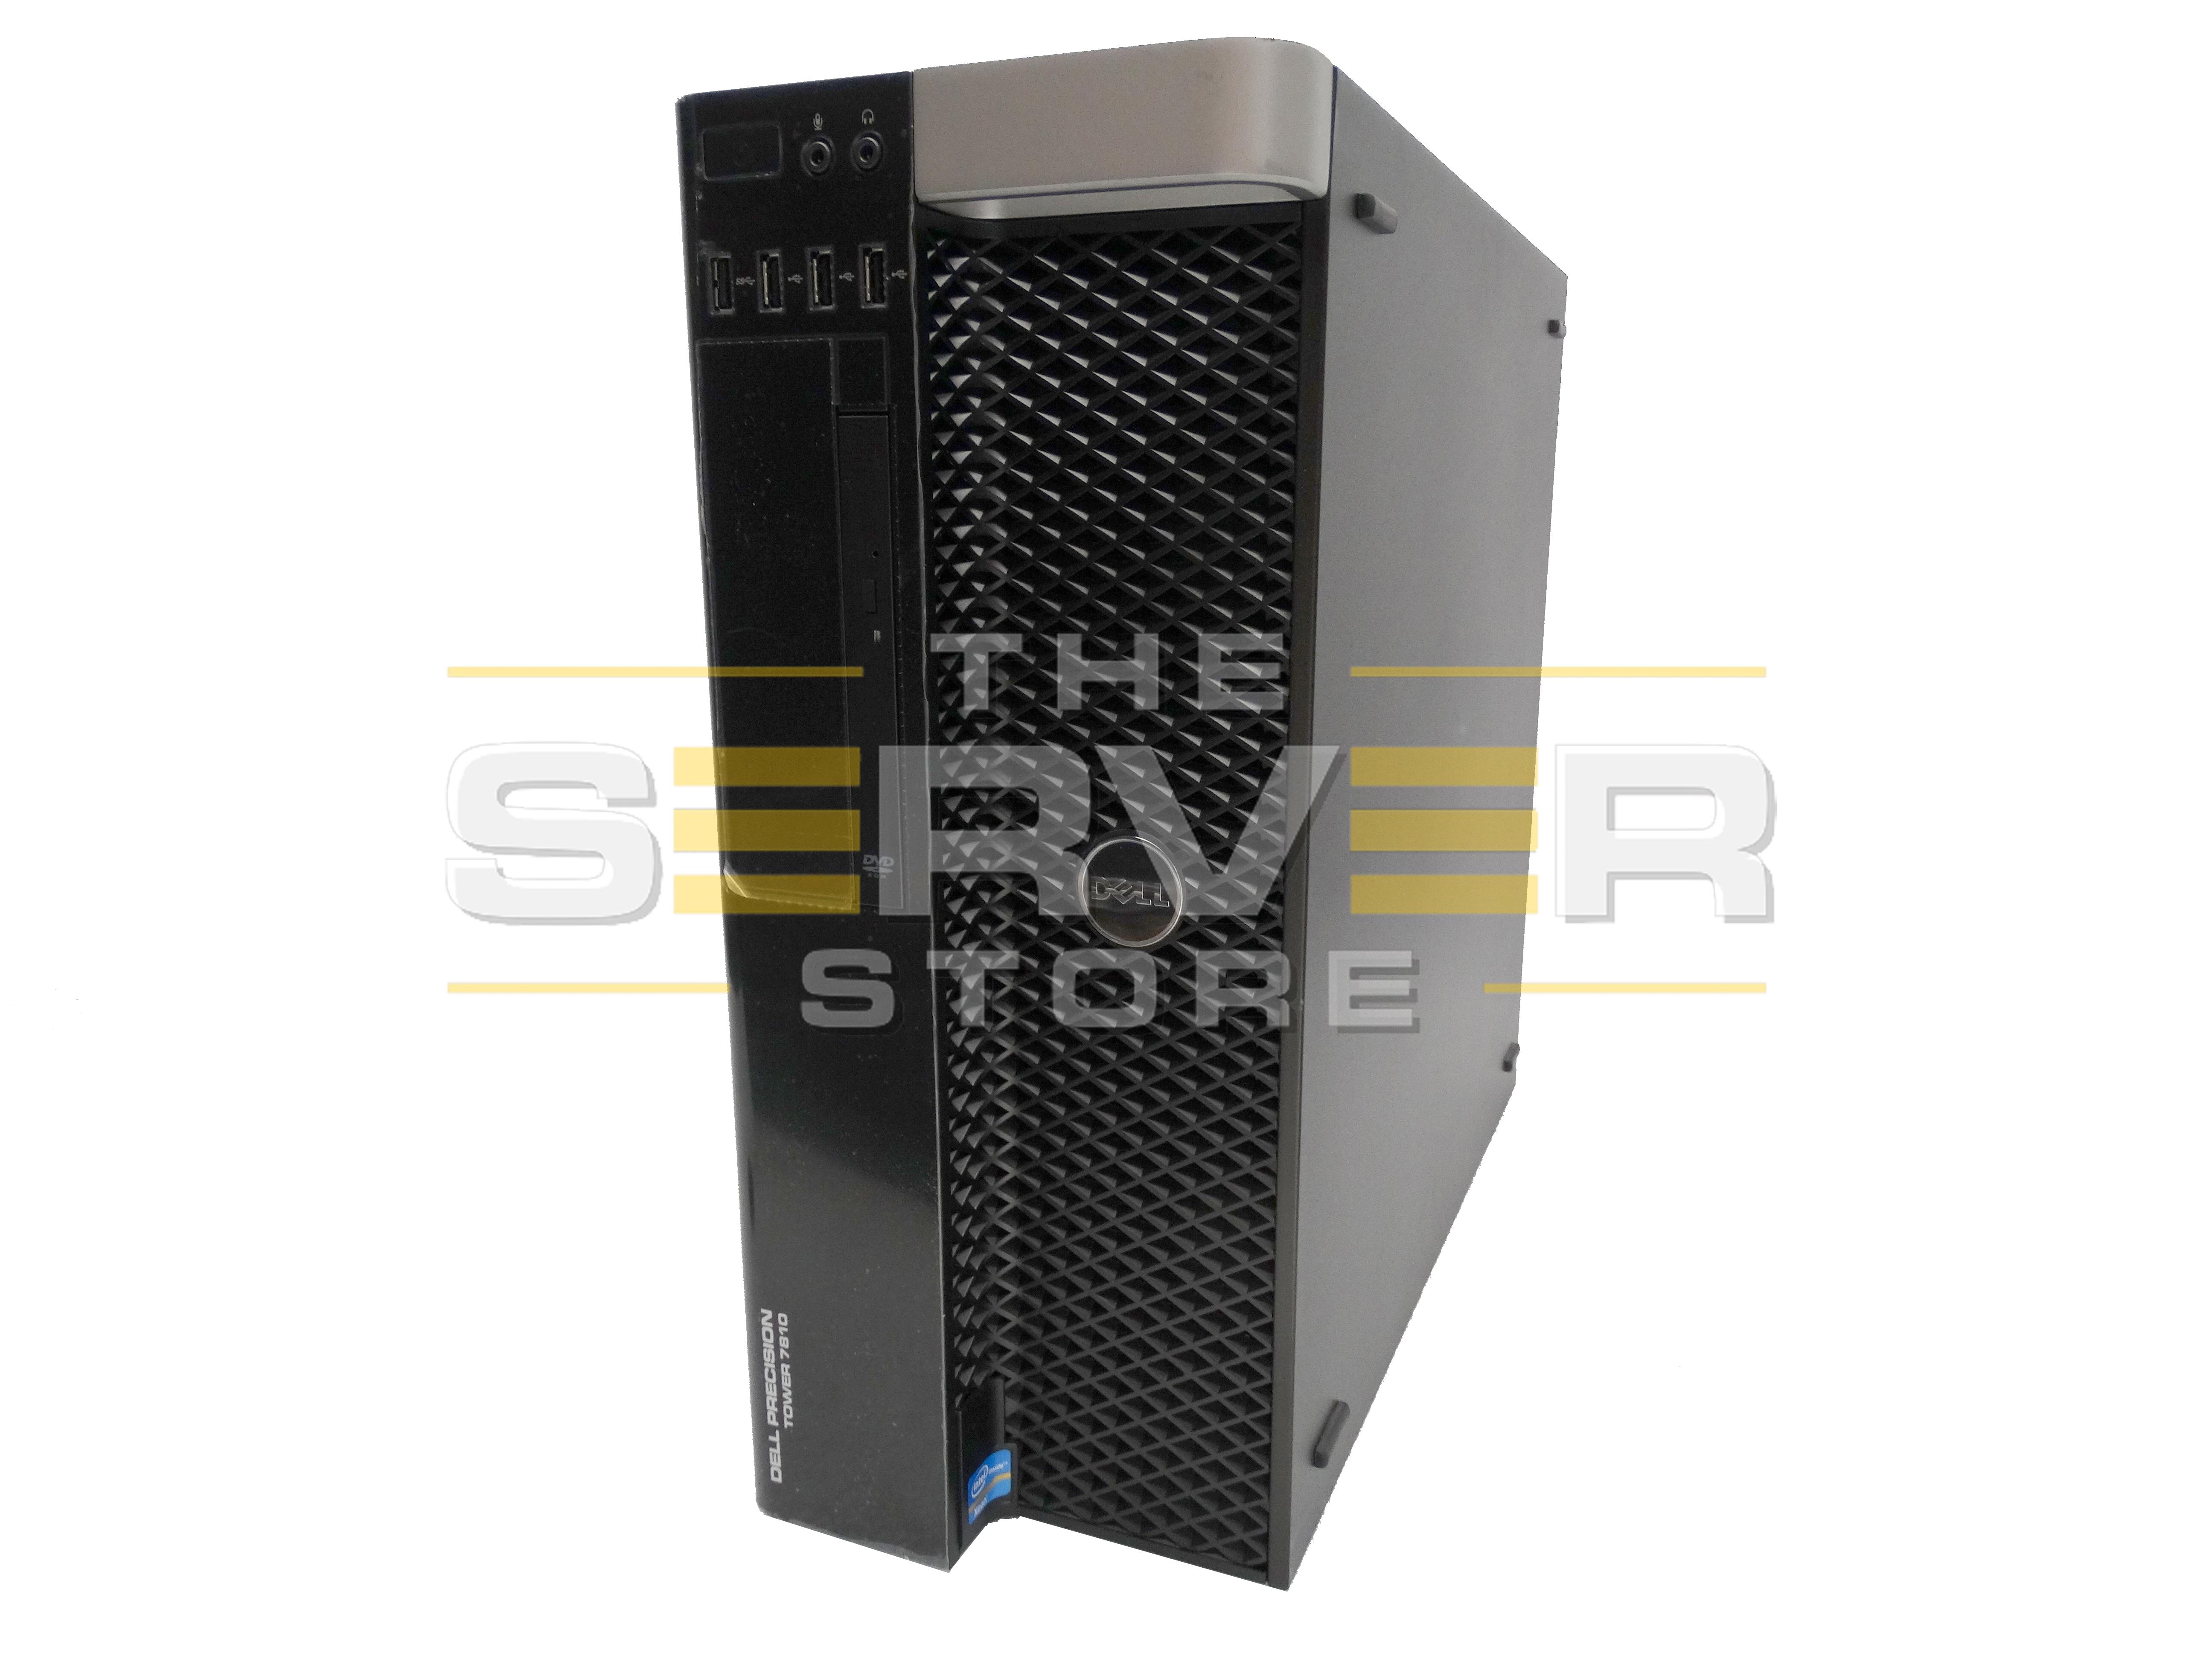 Dell Precision Tower 7810 (T7810) Workstation